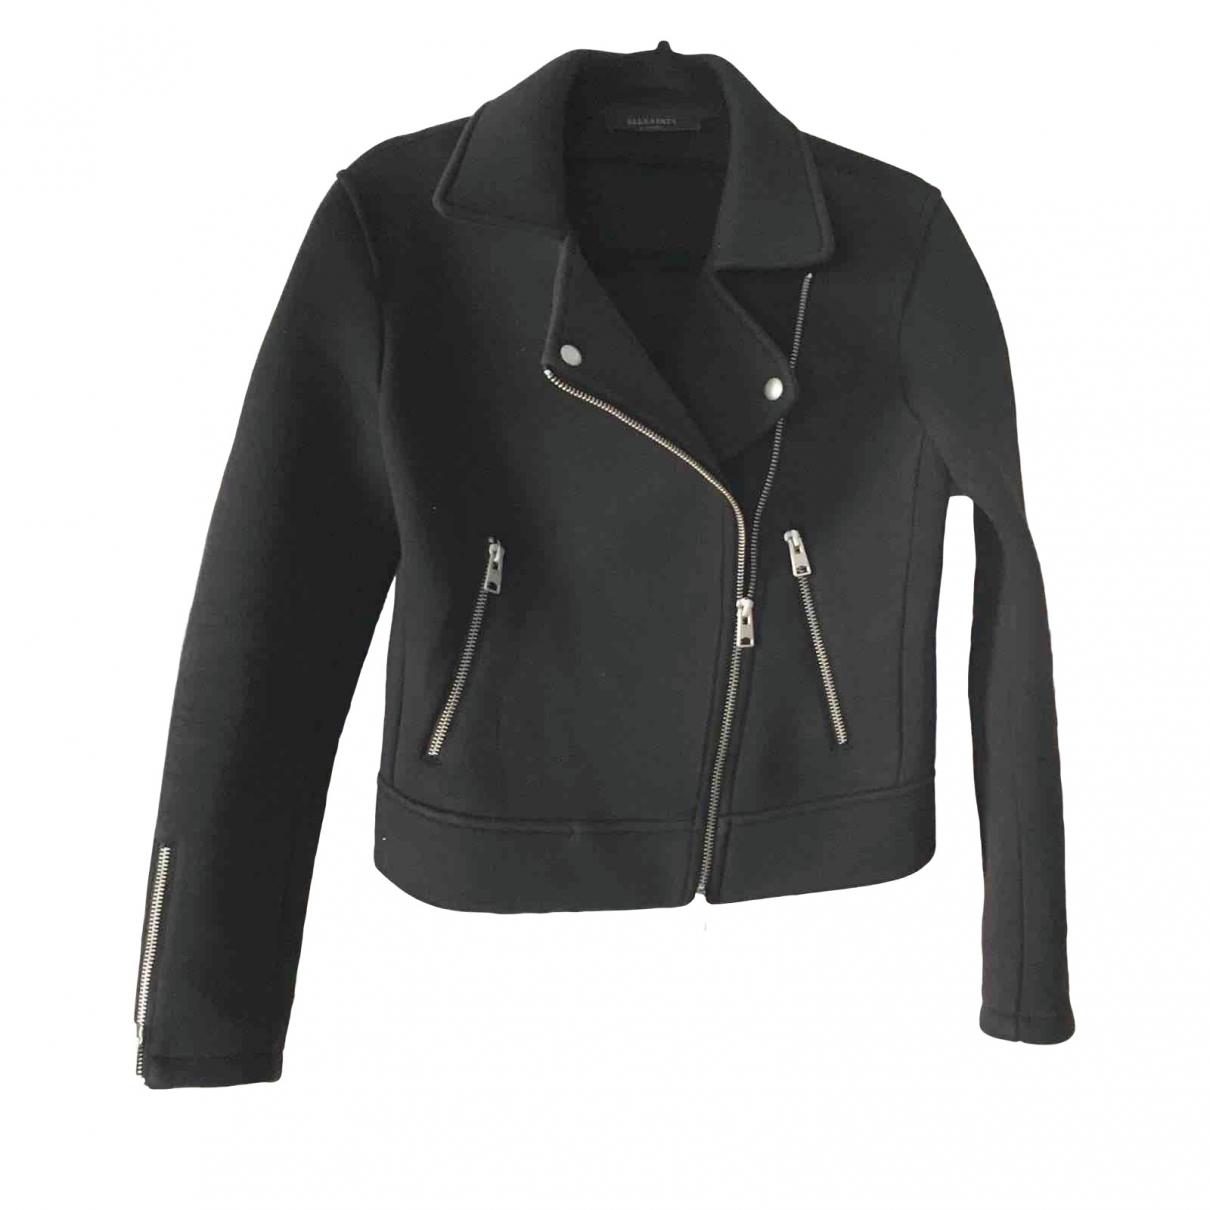 All Saints \N Black Cotton jacket for Women XS International